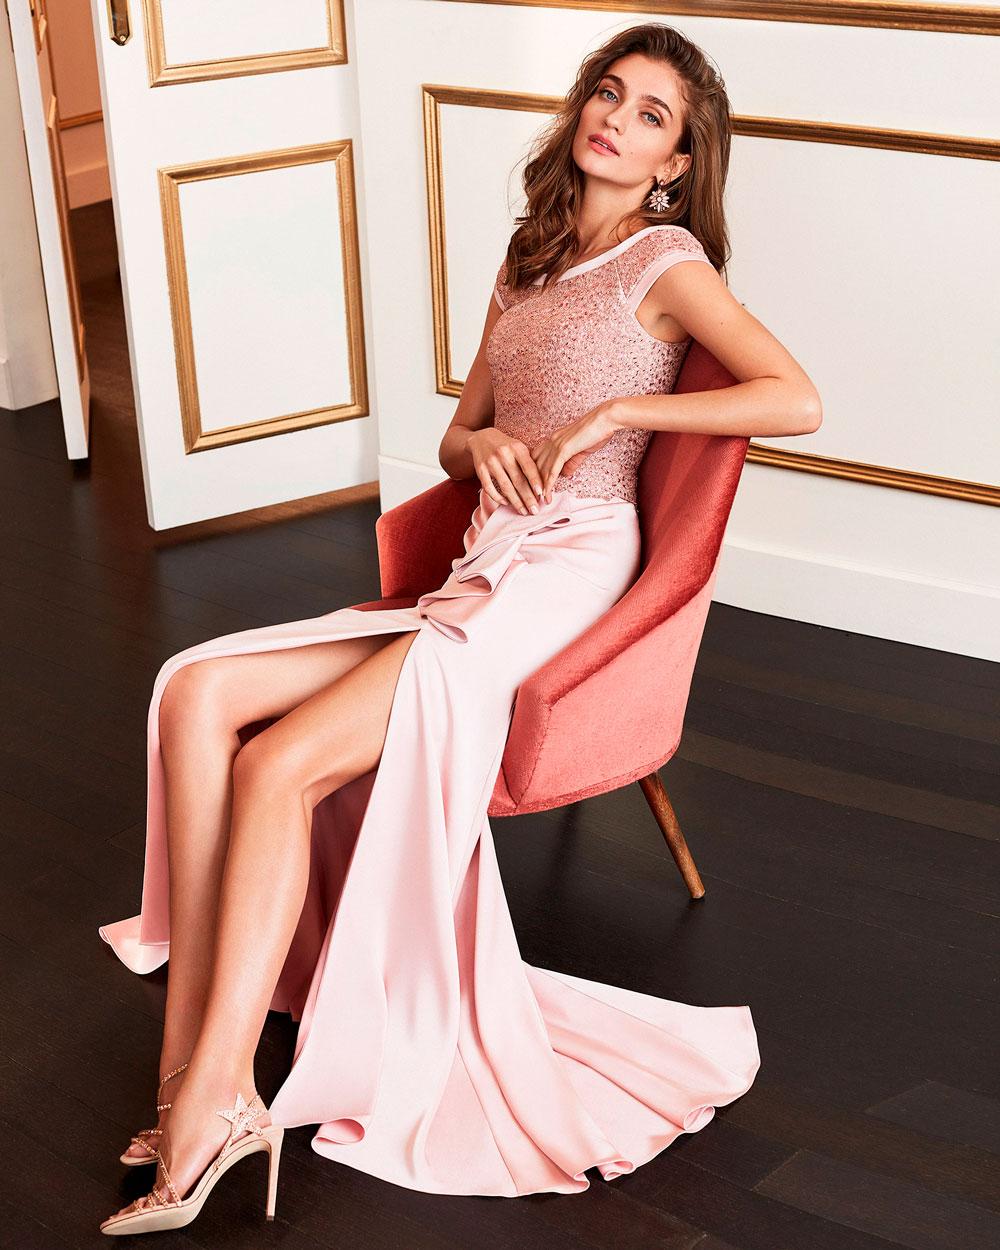 vestido de fiesta 2020 4J159 MARFIL BARCELONA 3